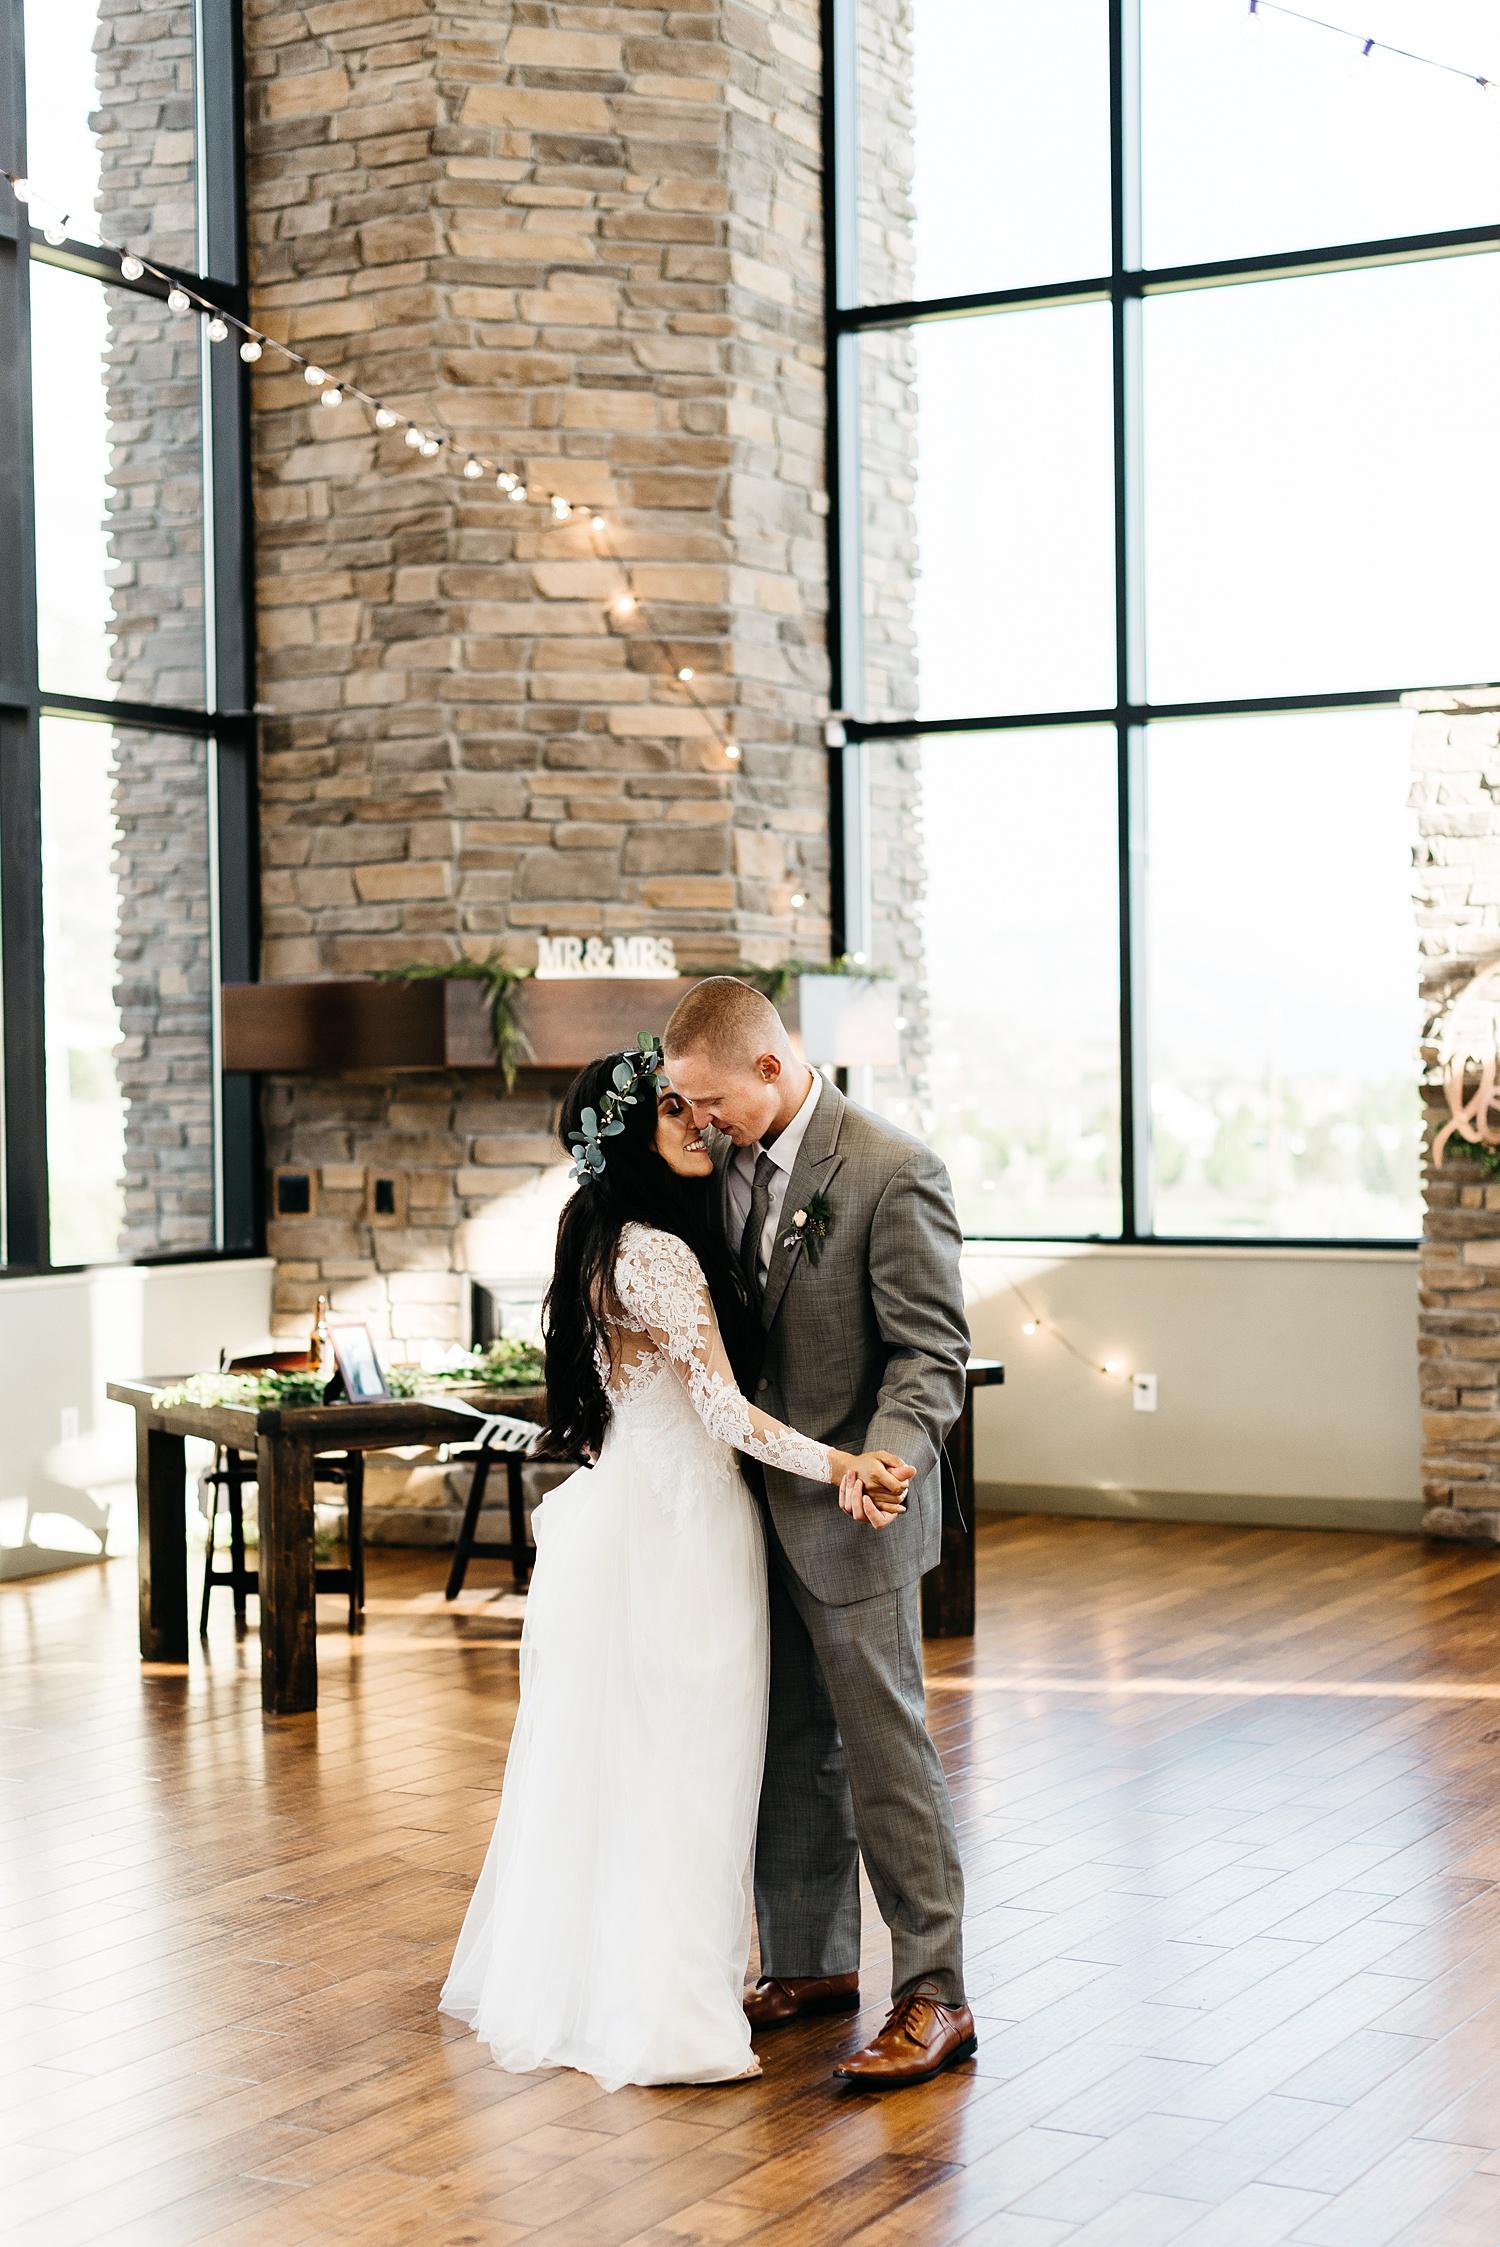 Zandra Barriga Photo - Darian and Colton Wedding_0058.jpg